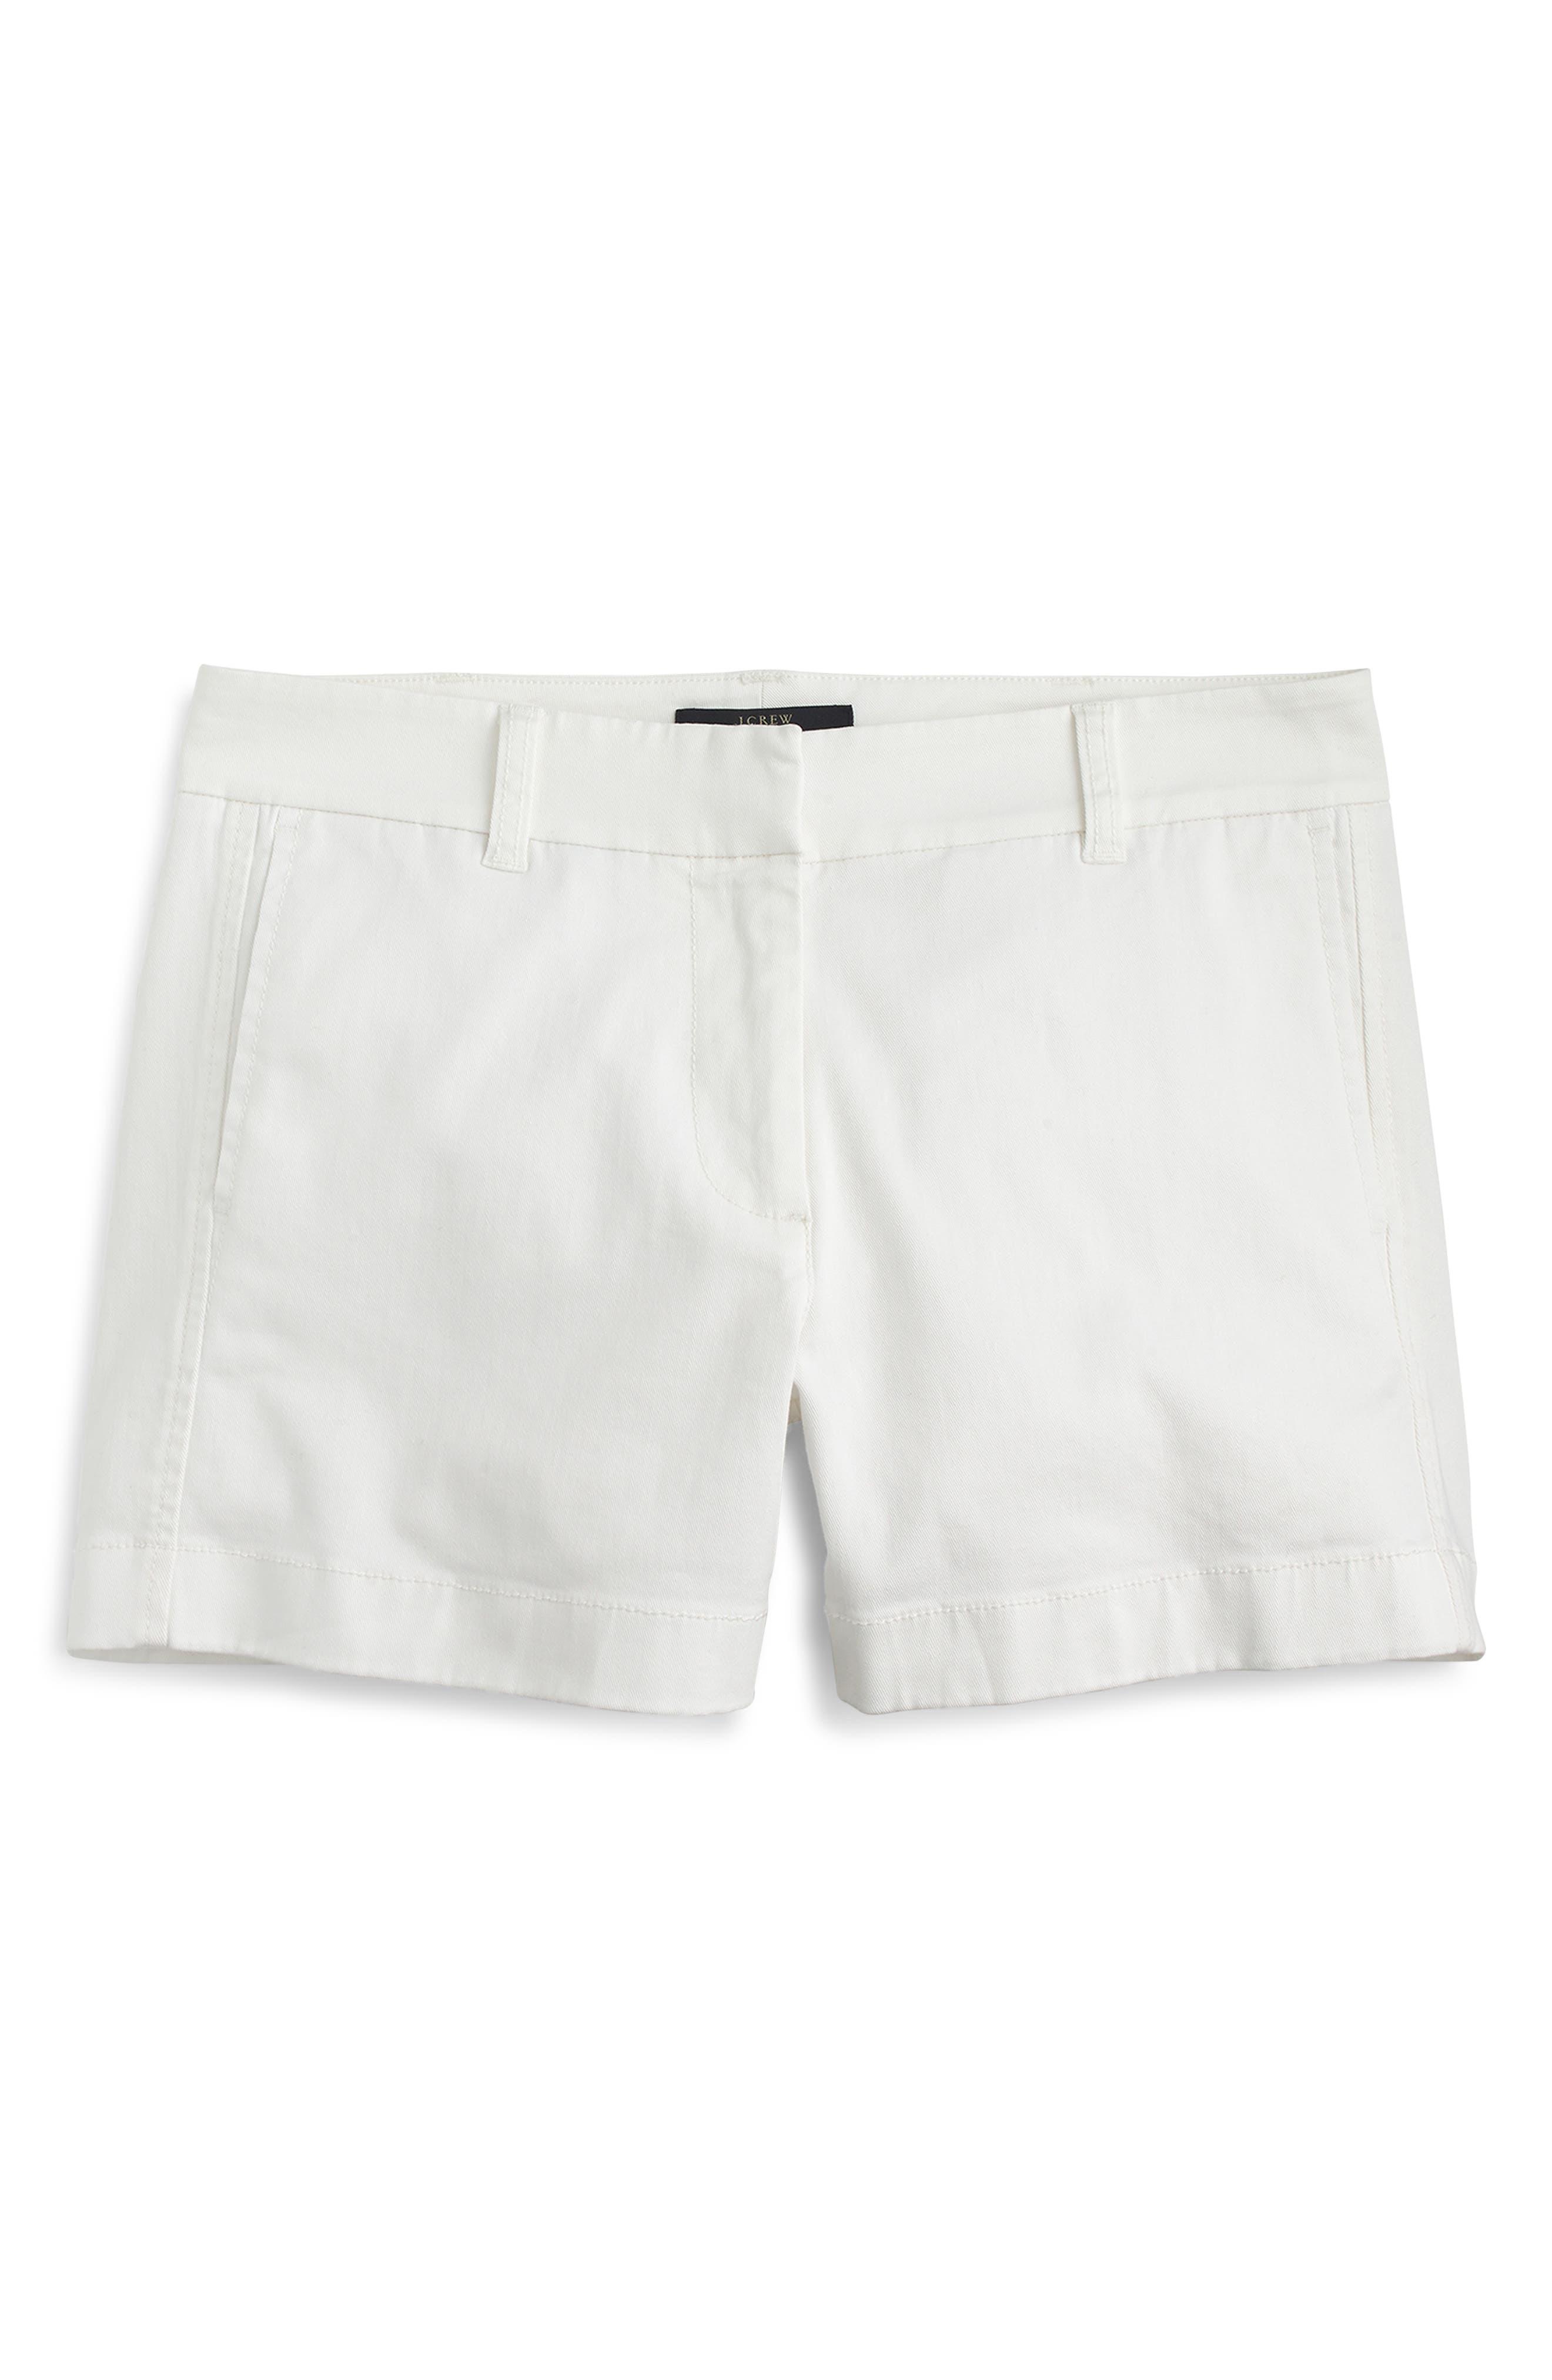 Women's J.crew Stretch Classic Chino Shorts,  00 - White